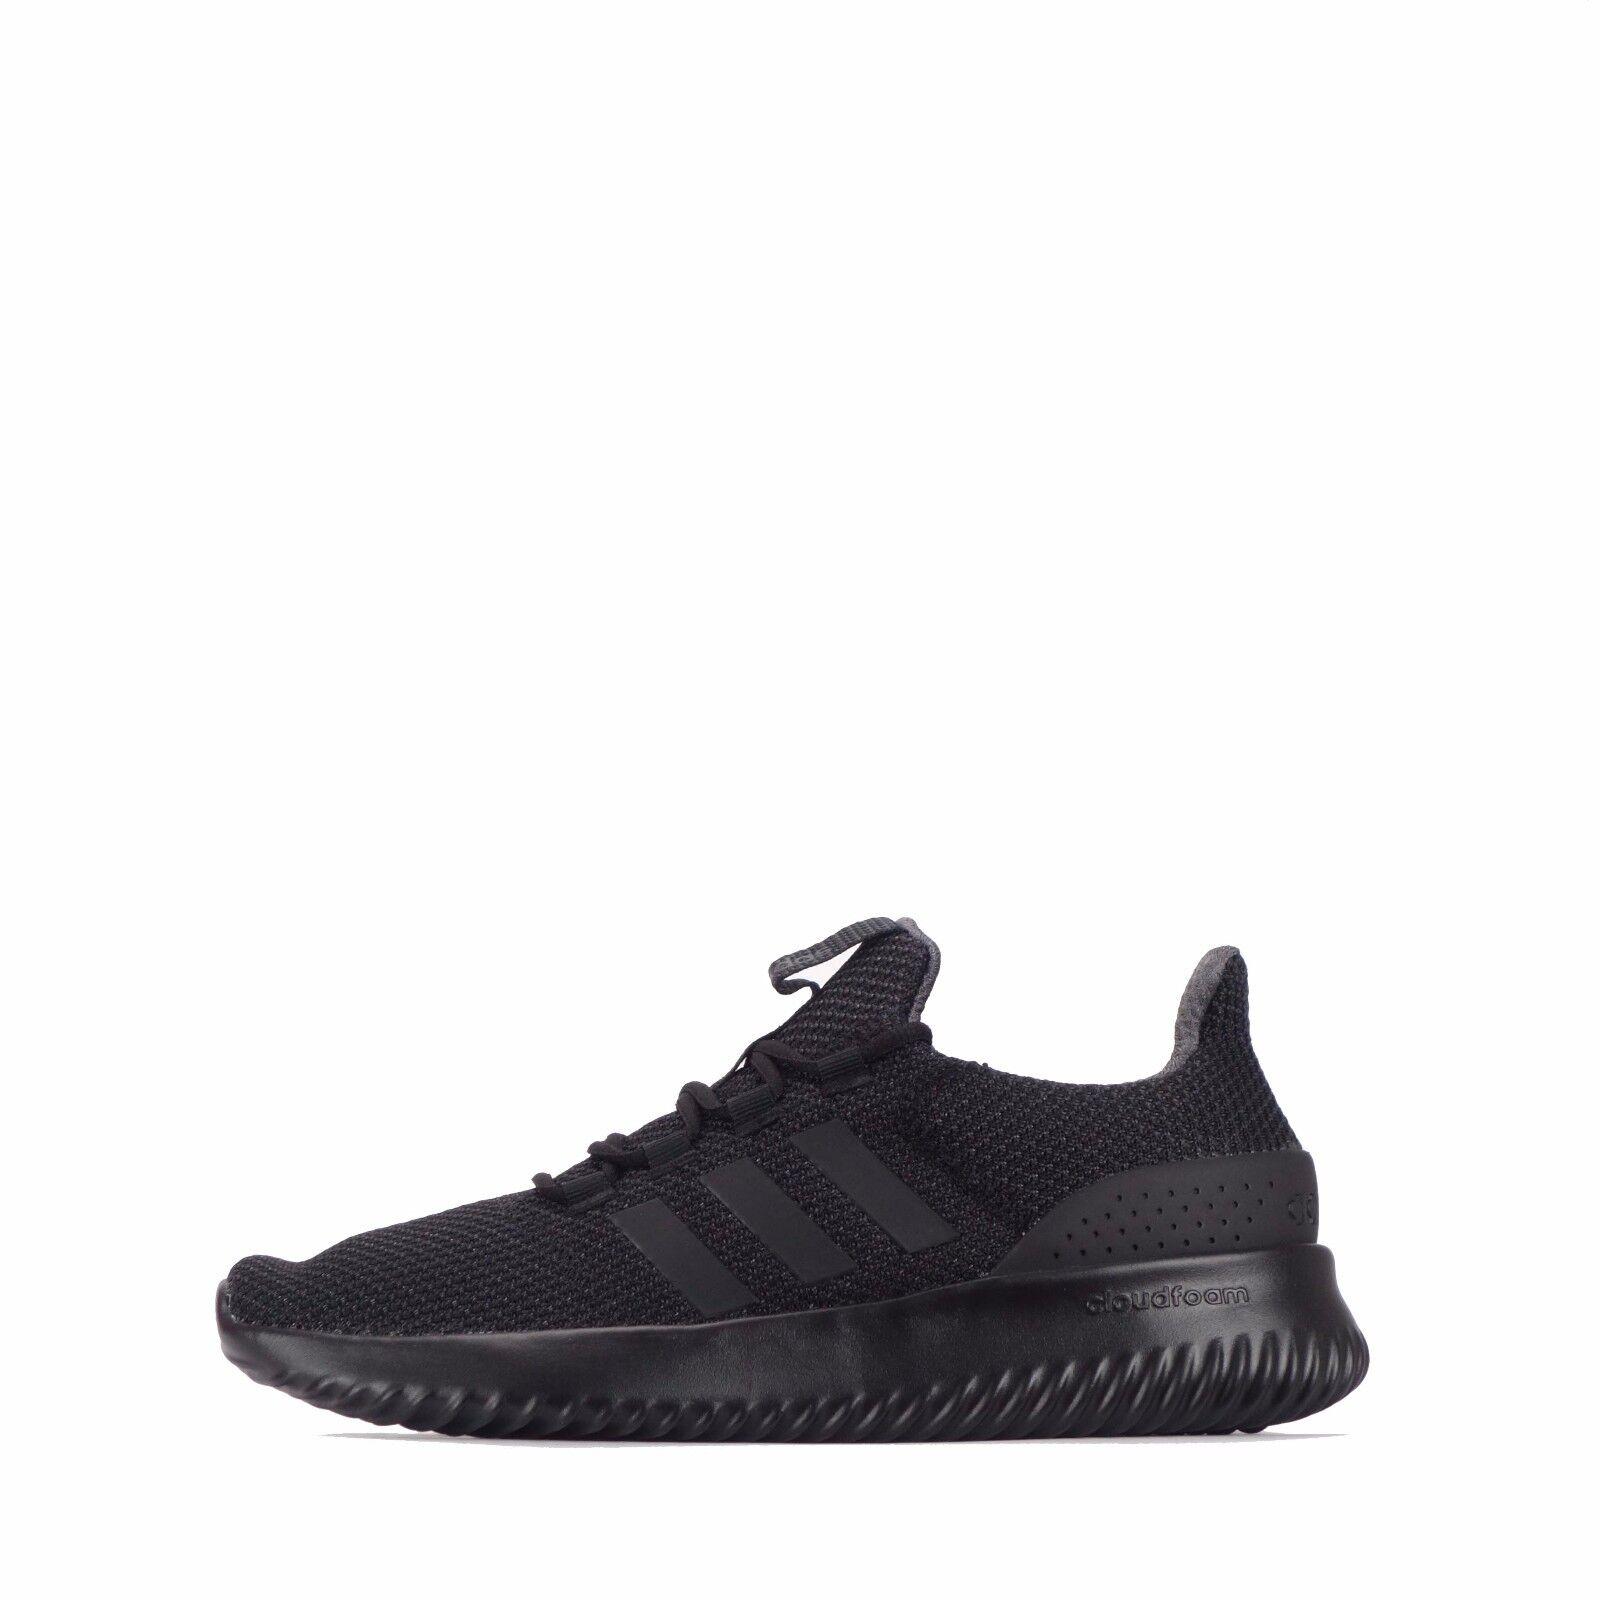 Adidas Neo Cloudfoam Chaussures Hommes Triple Noir